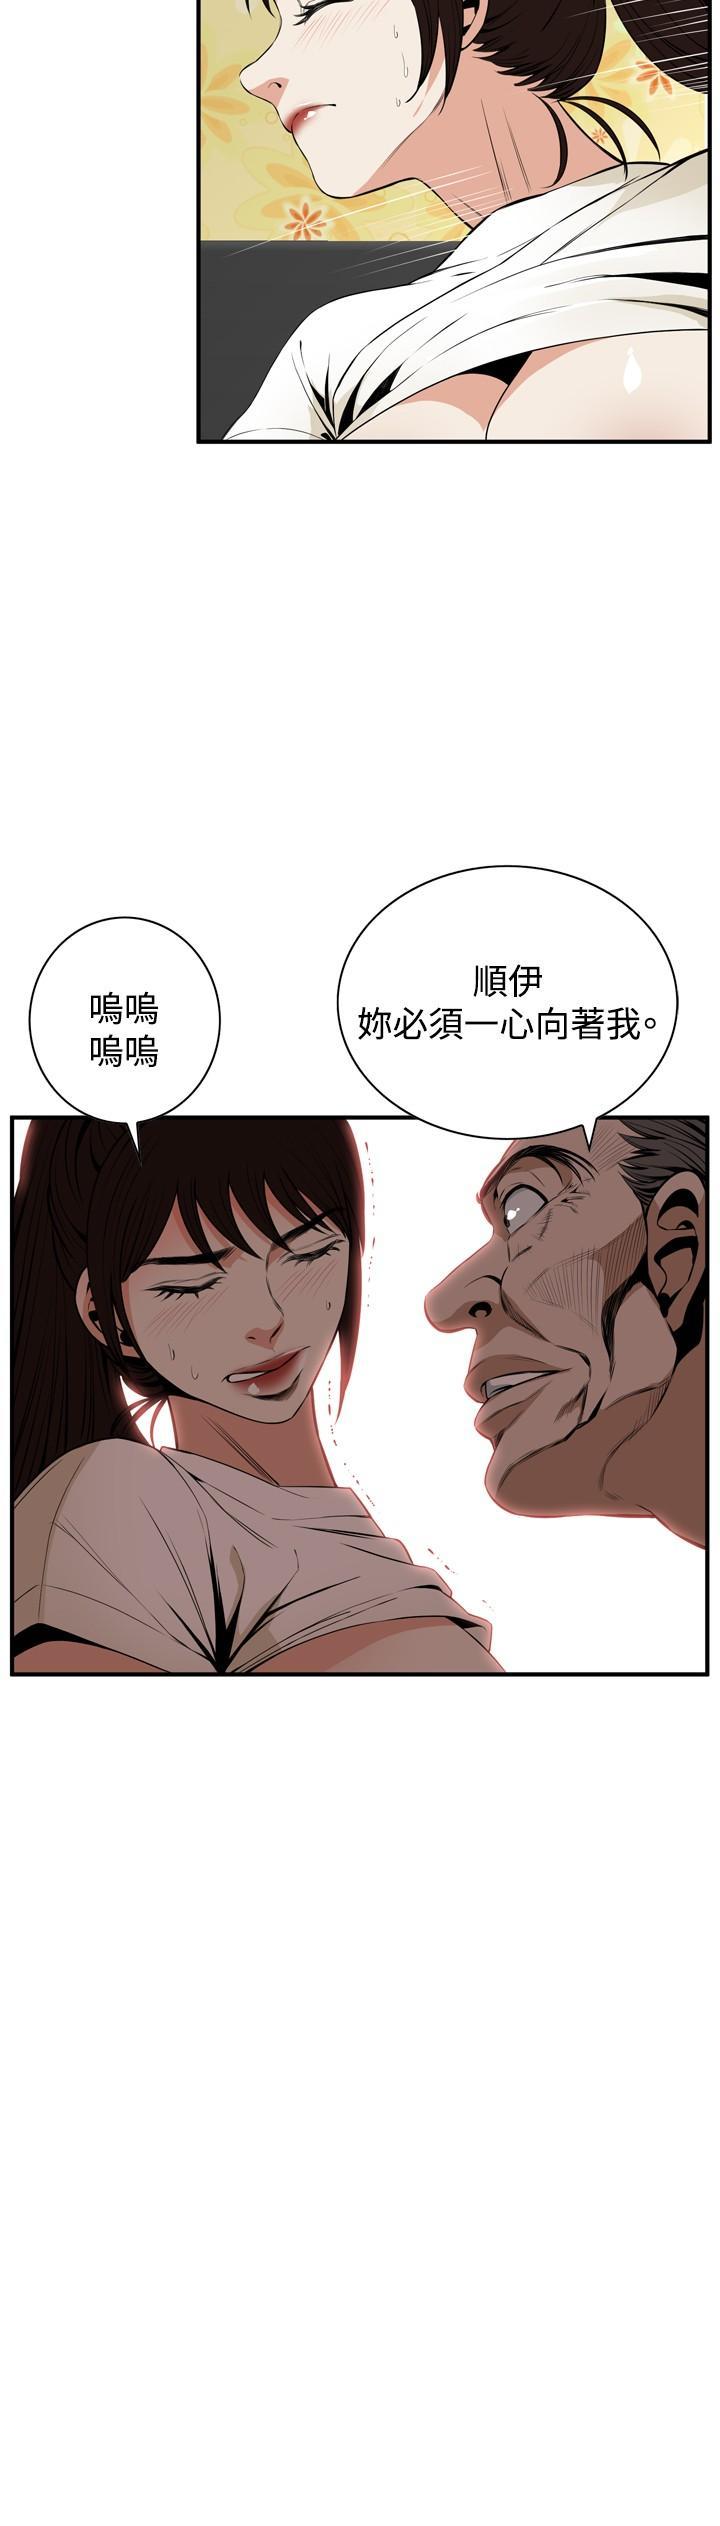 Take a Peek 偷窥 Ch.39~60 [Chinese]中文 9